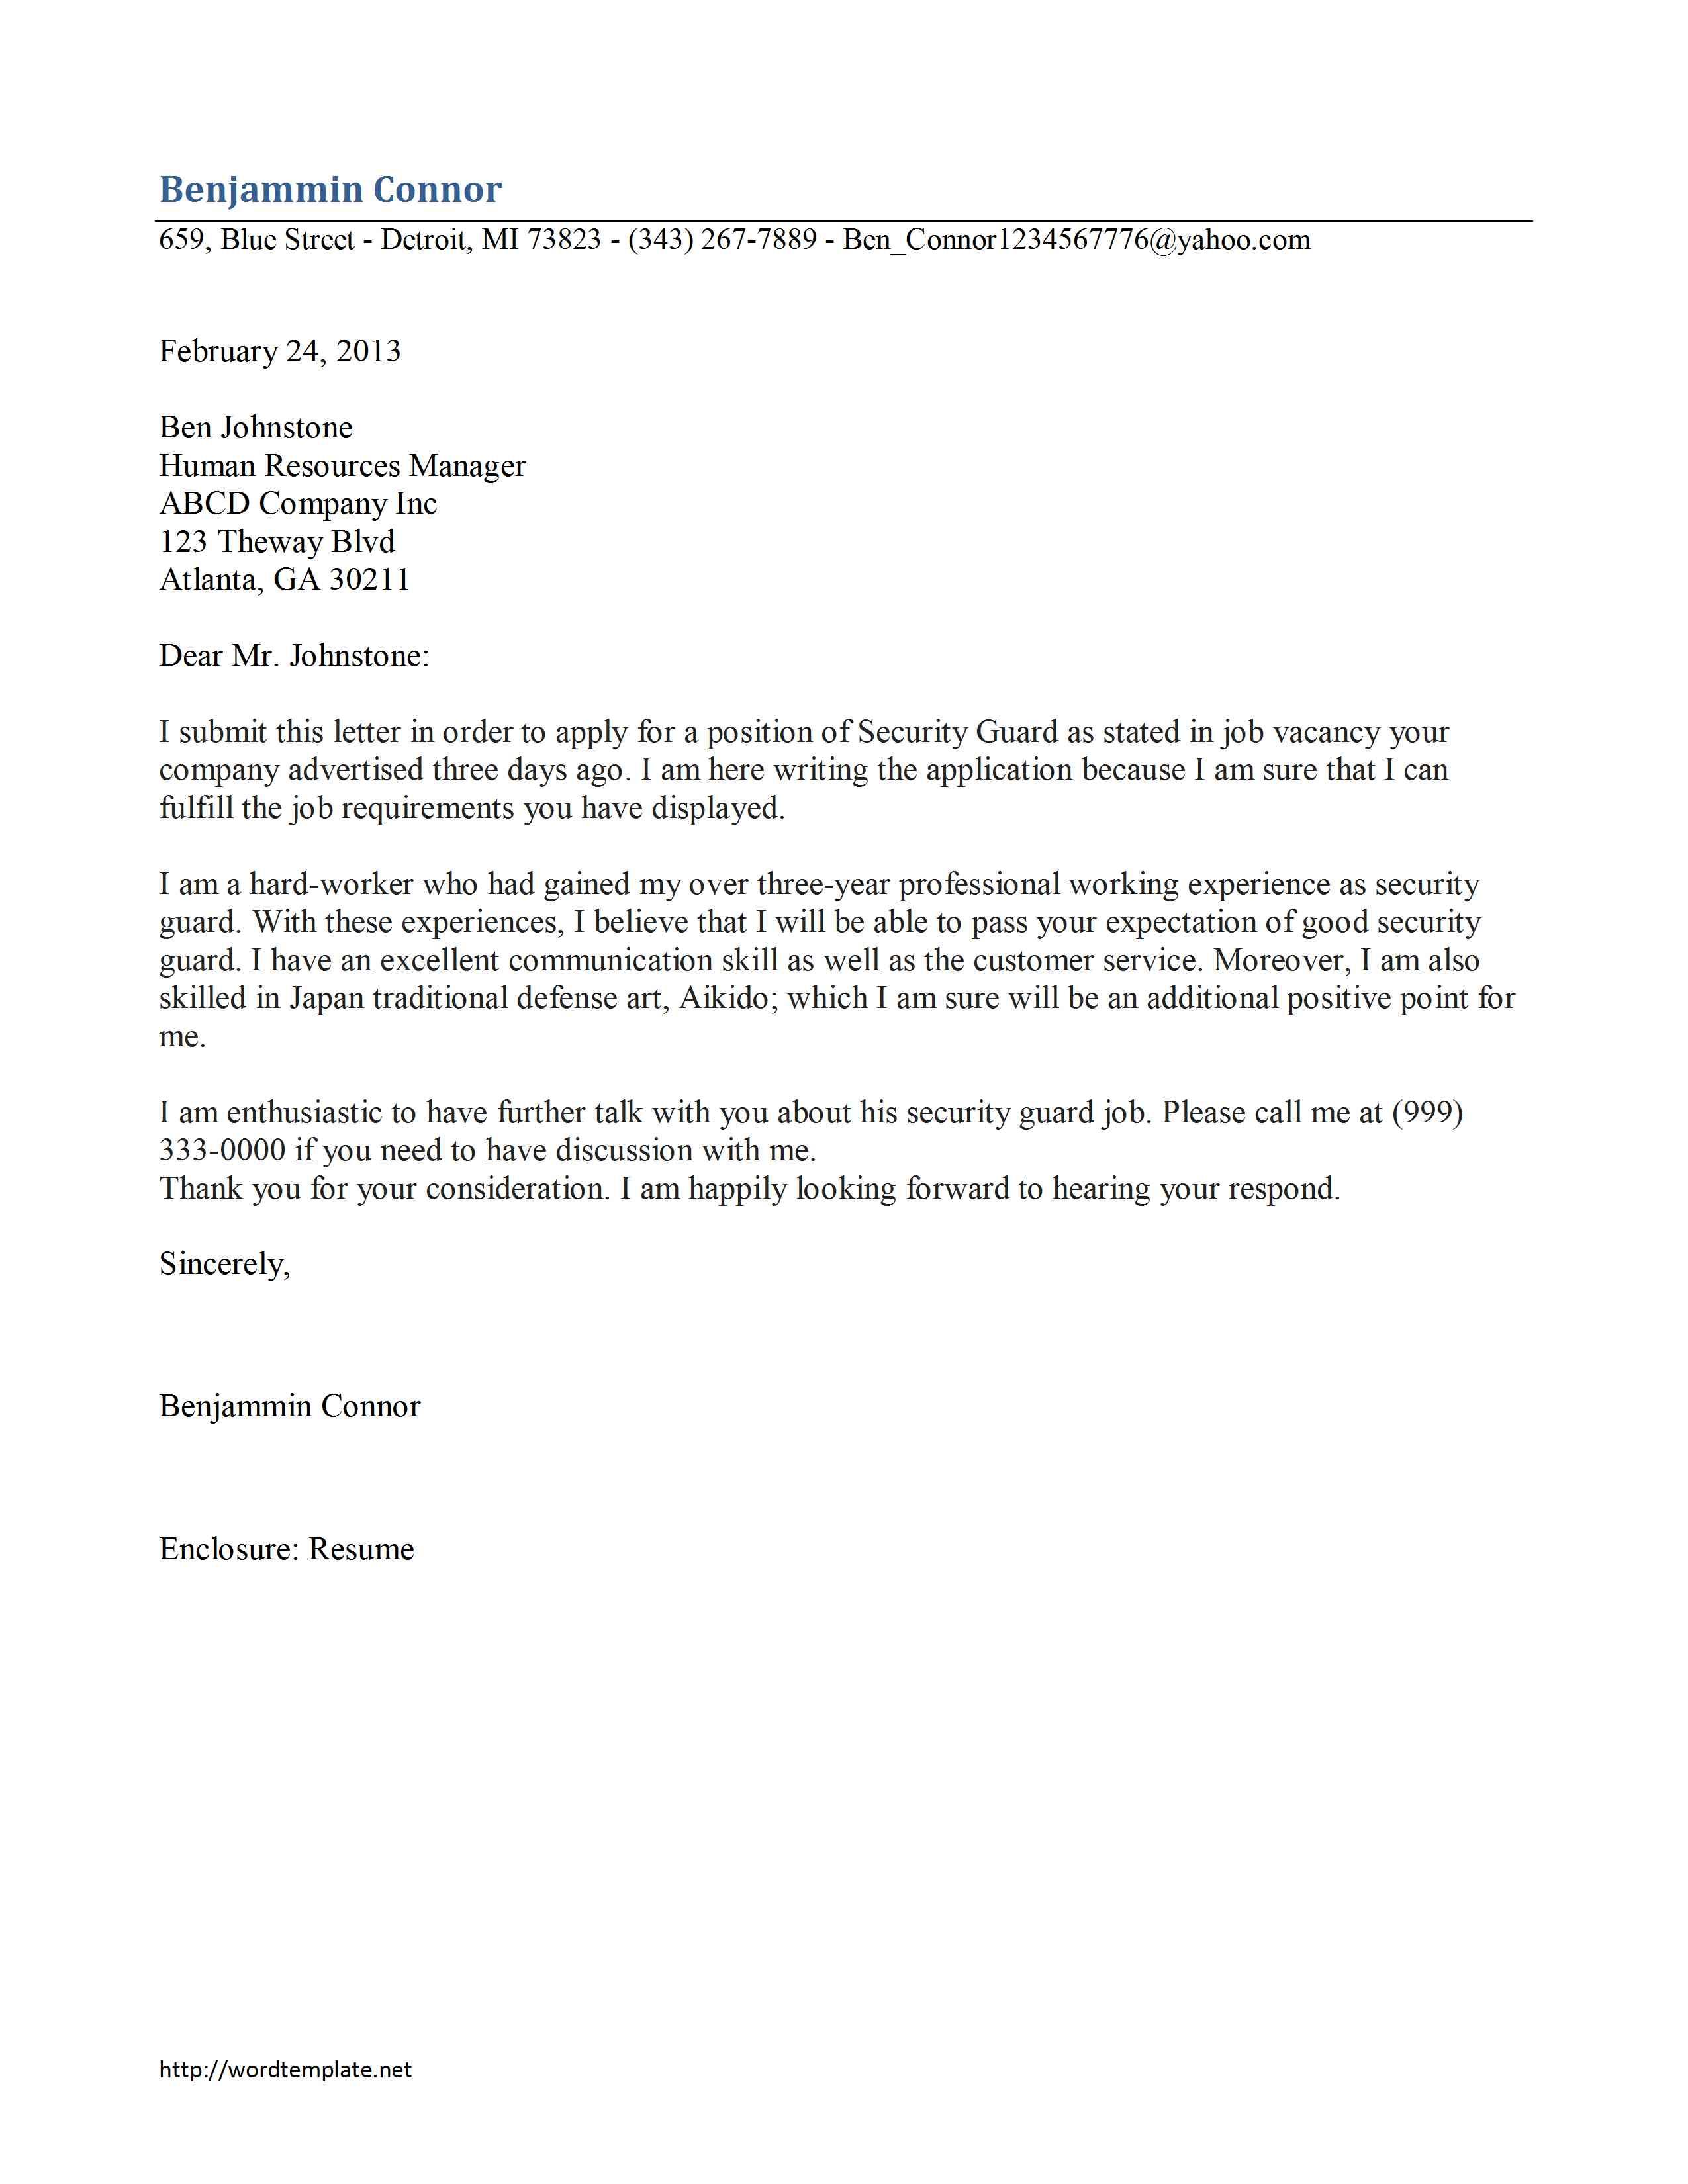 free resume template security guard - Sample Security Guard Resume